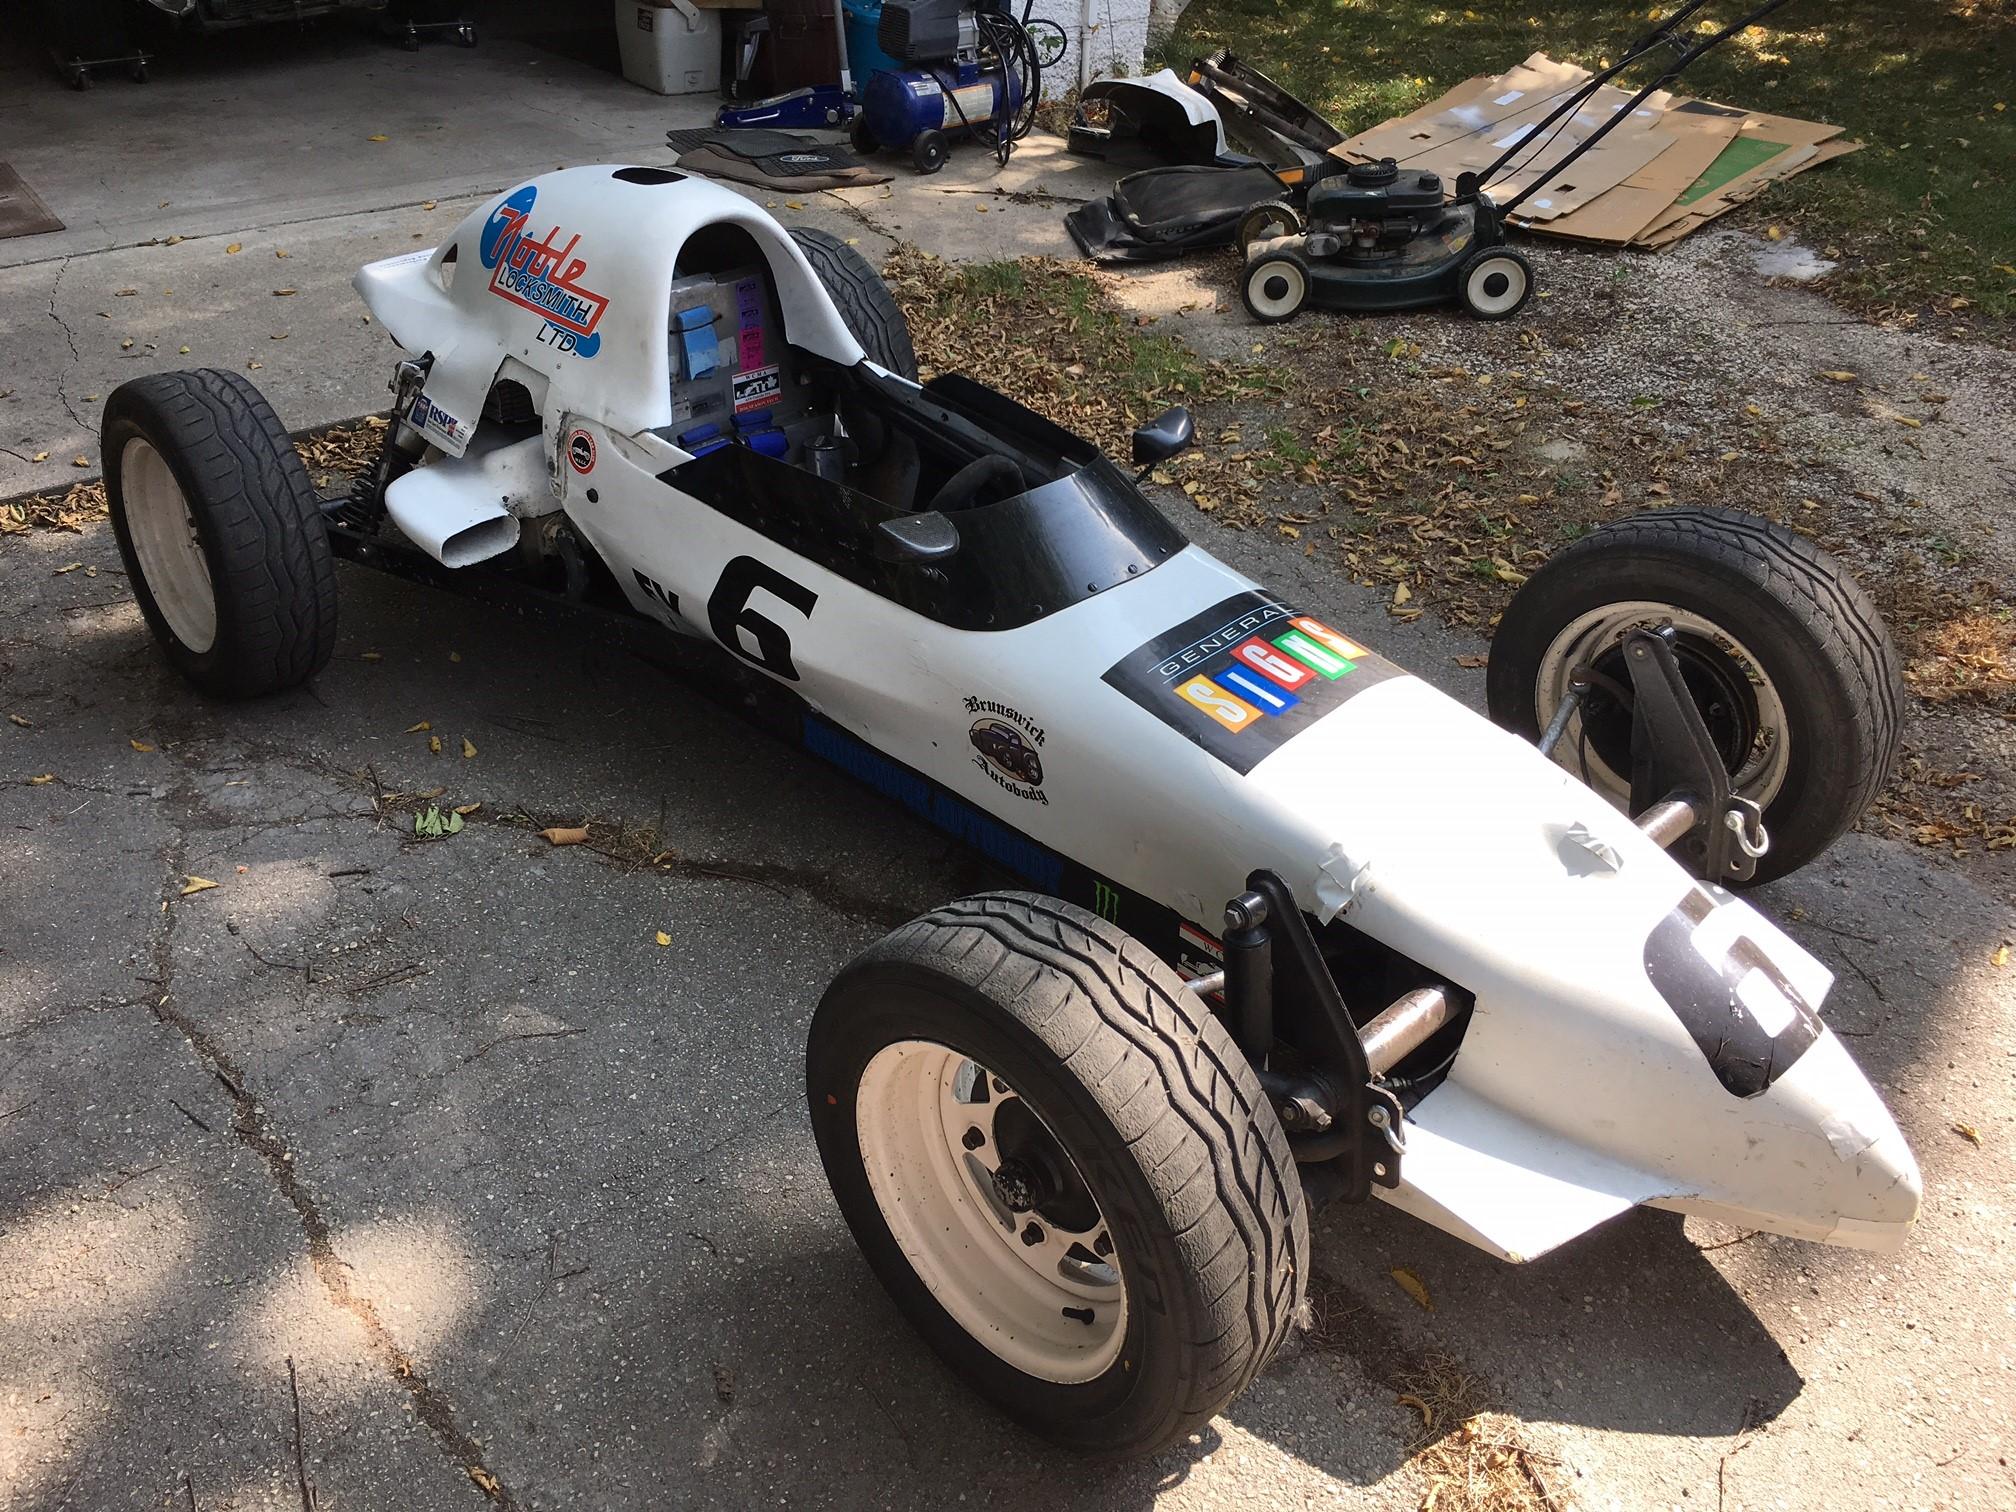 Arkansas Bill Of Sale >> 1976 Lynx B Formula Vee Race Car For Sale - $2880